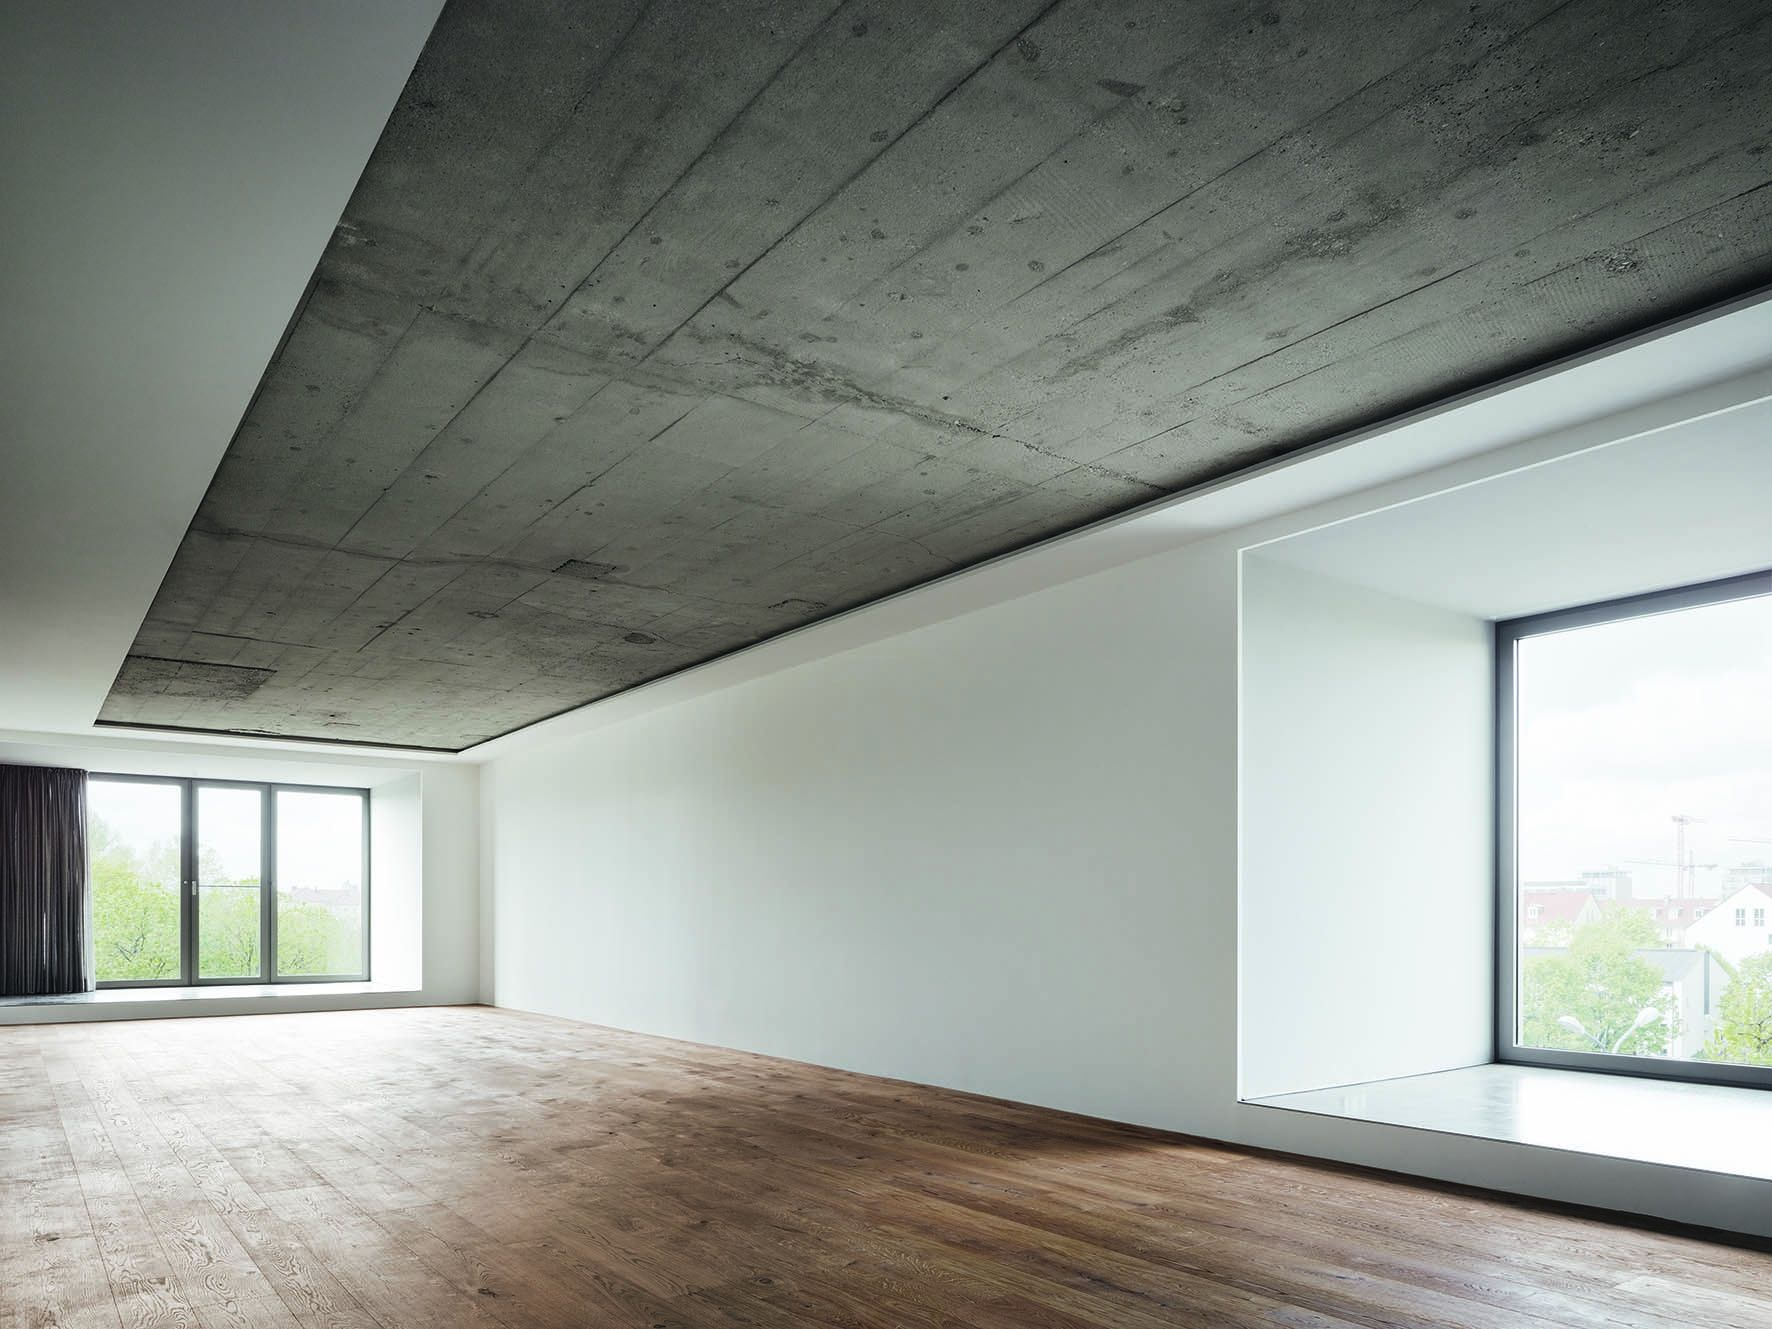 Betondecke Home Decor Pinterest Interior Architecture And